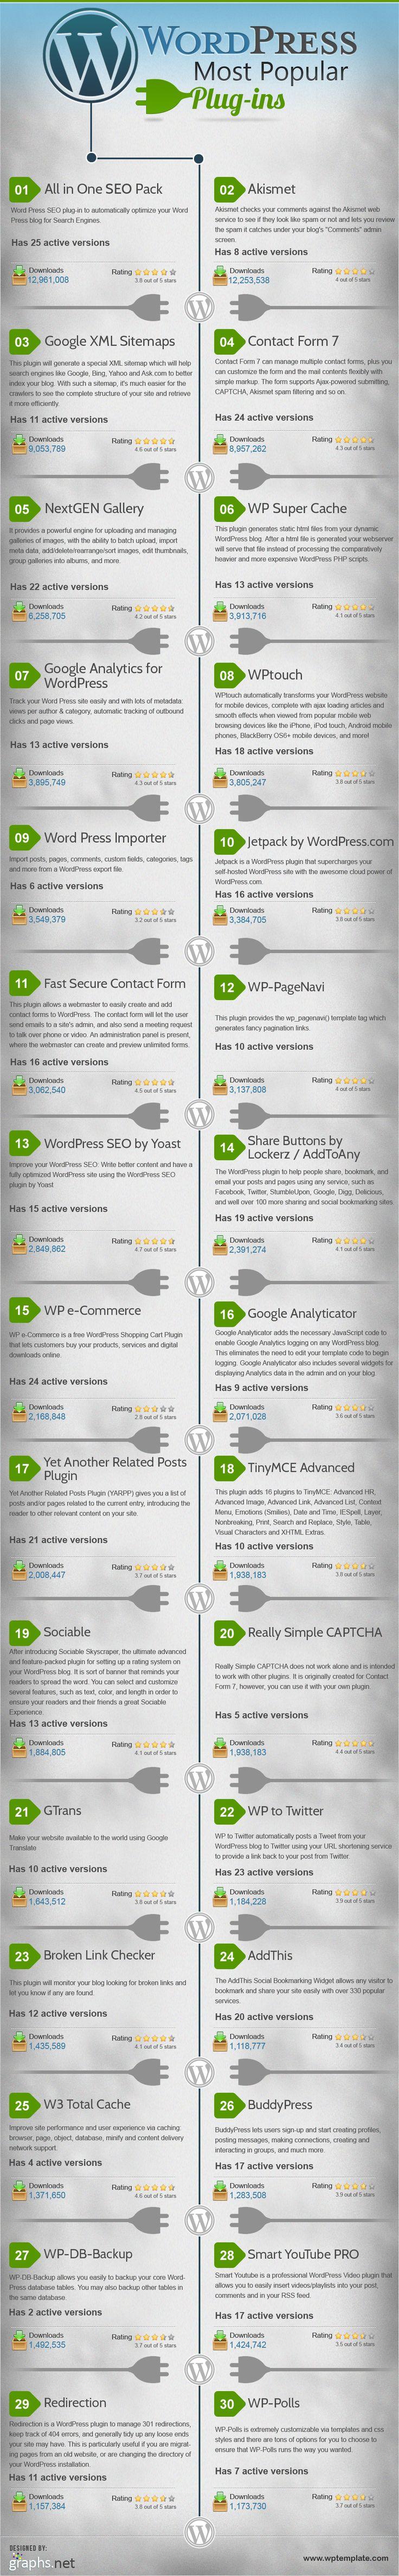 30 Most Popular #Wordpress Plugins [#Infographic] #Socialmedia